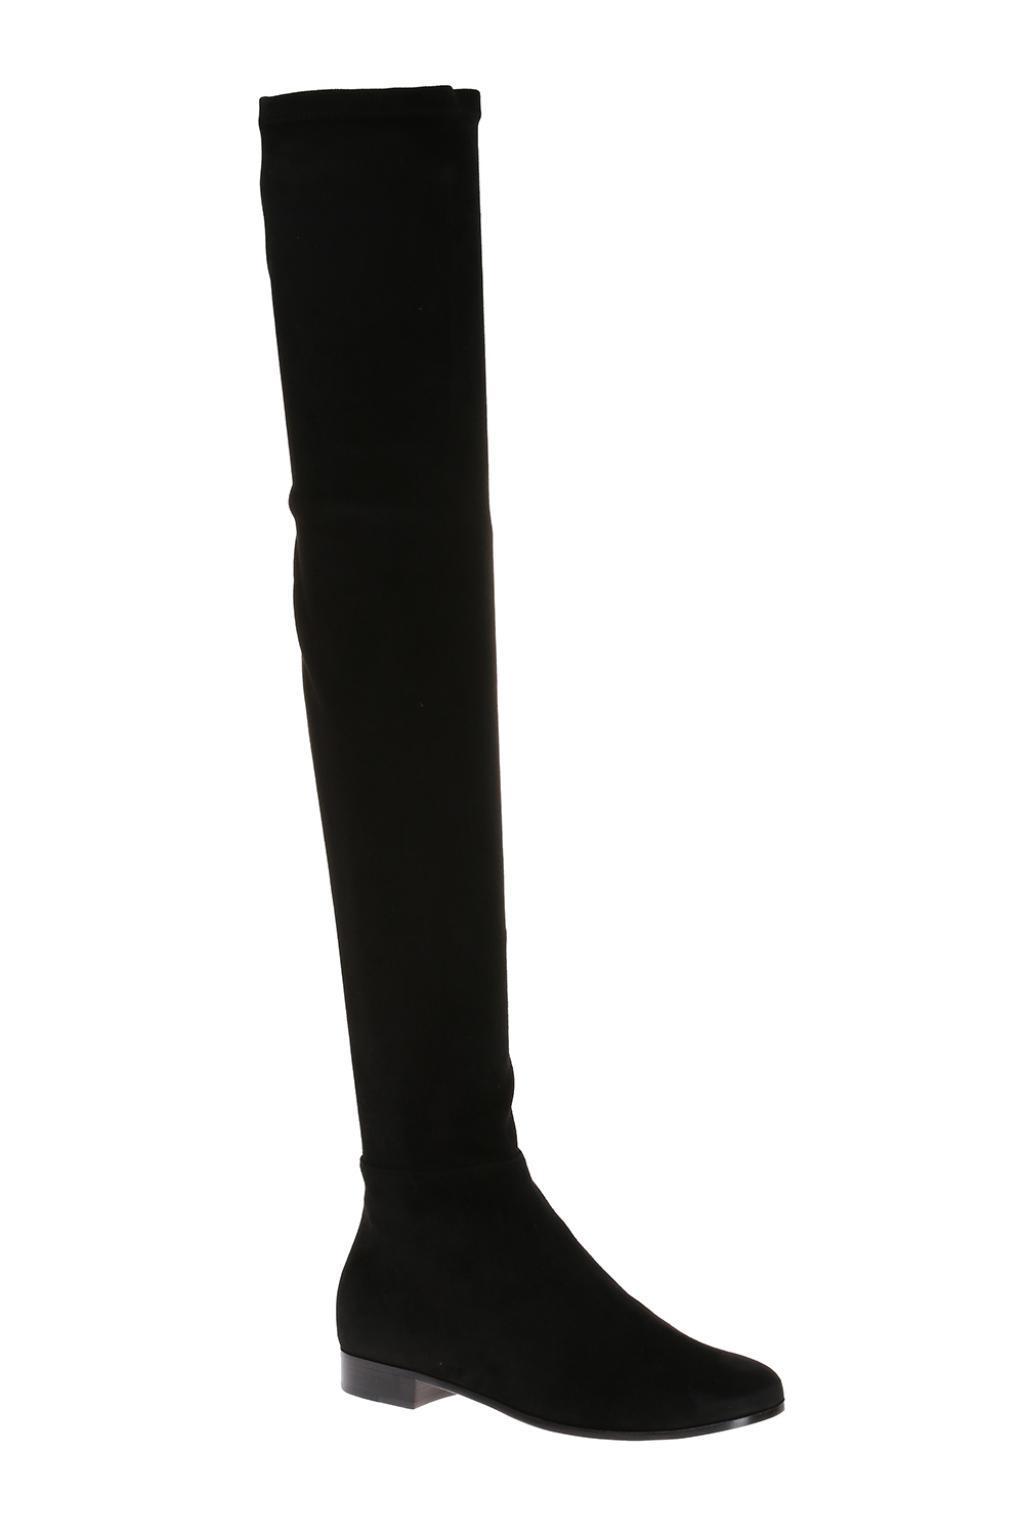 de63bd3c690 Jimmy Choo - Black  myren Flat  Suede Boots - Lyst. View fullscreen